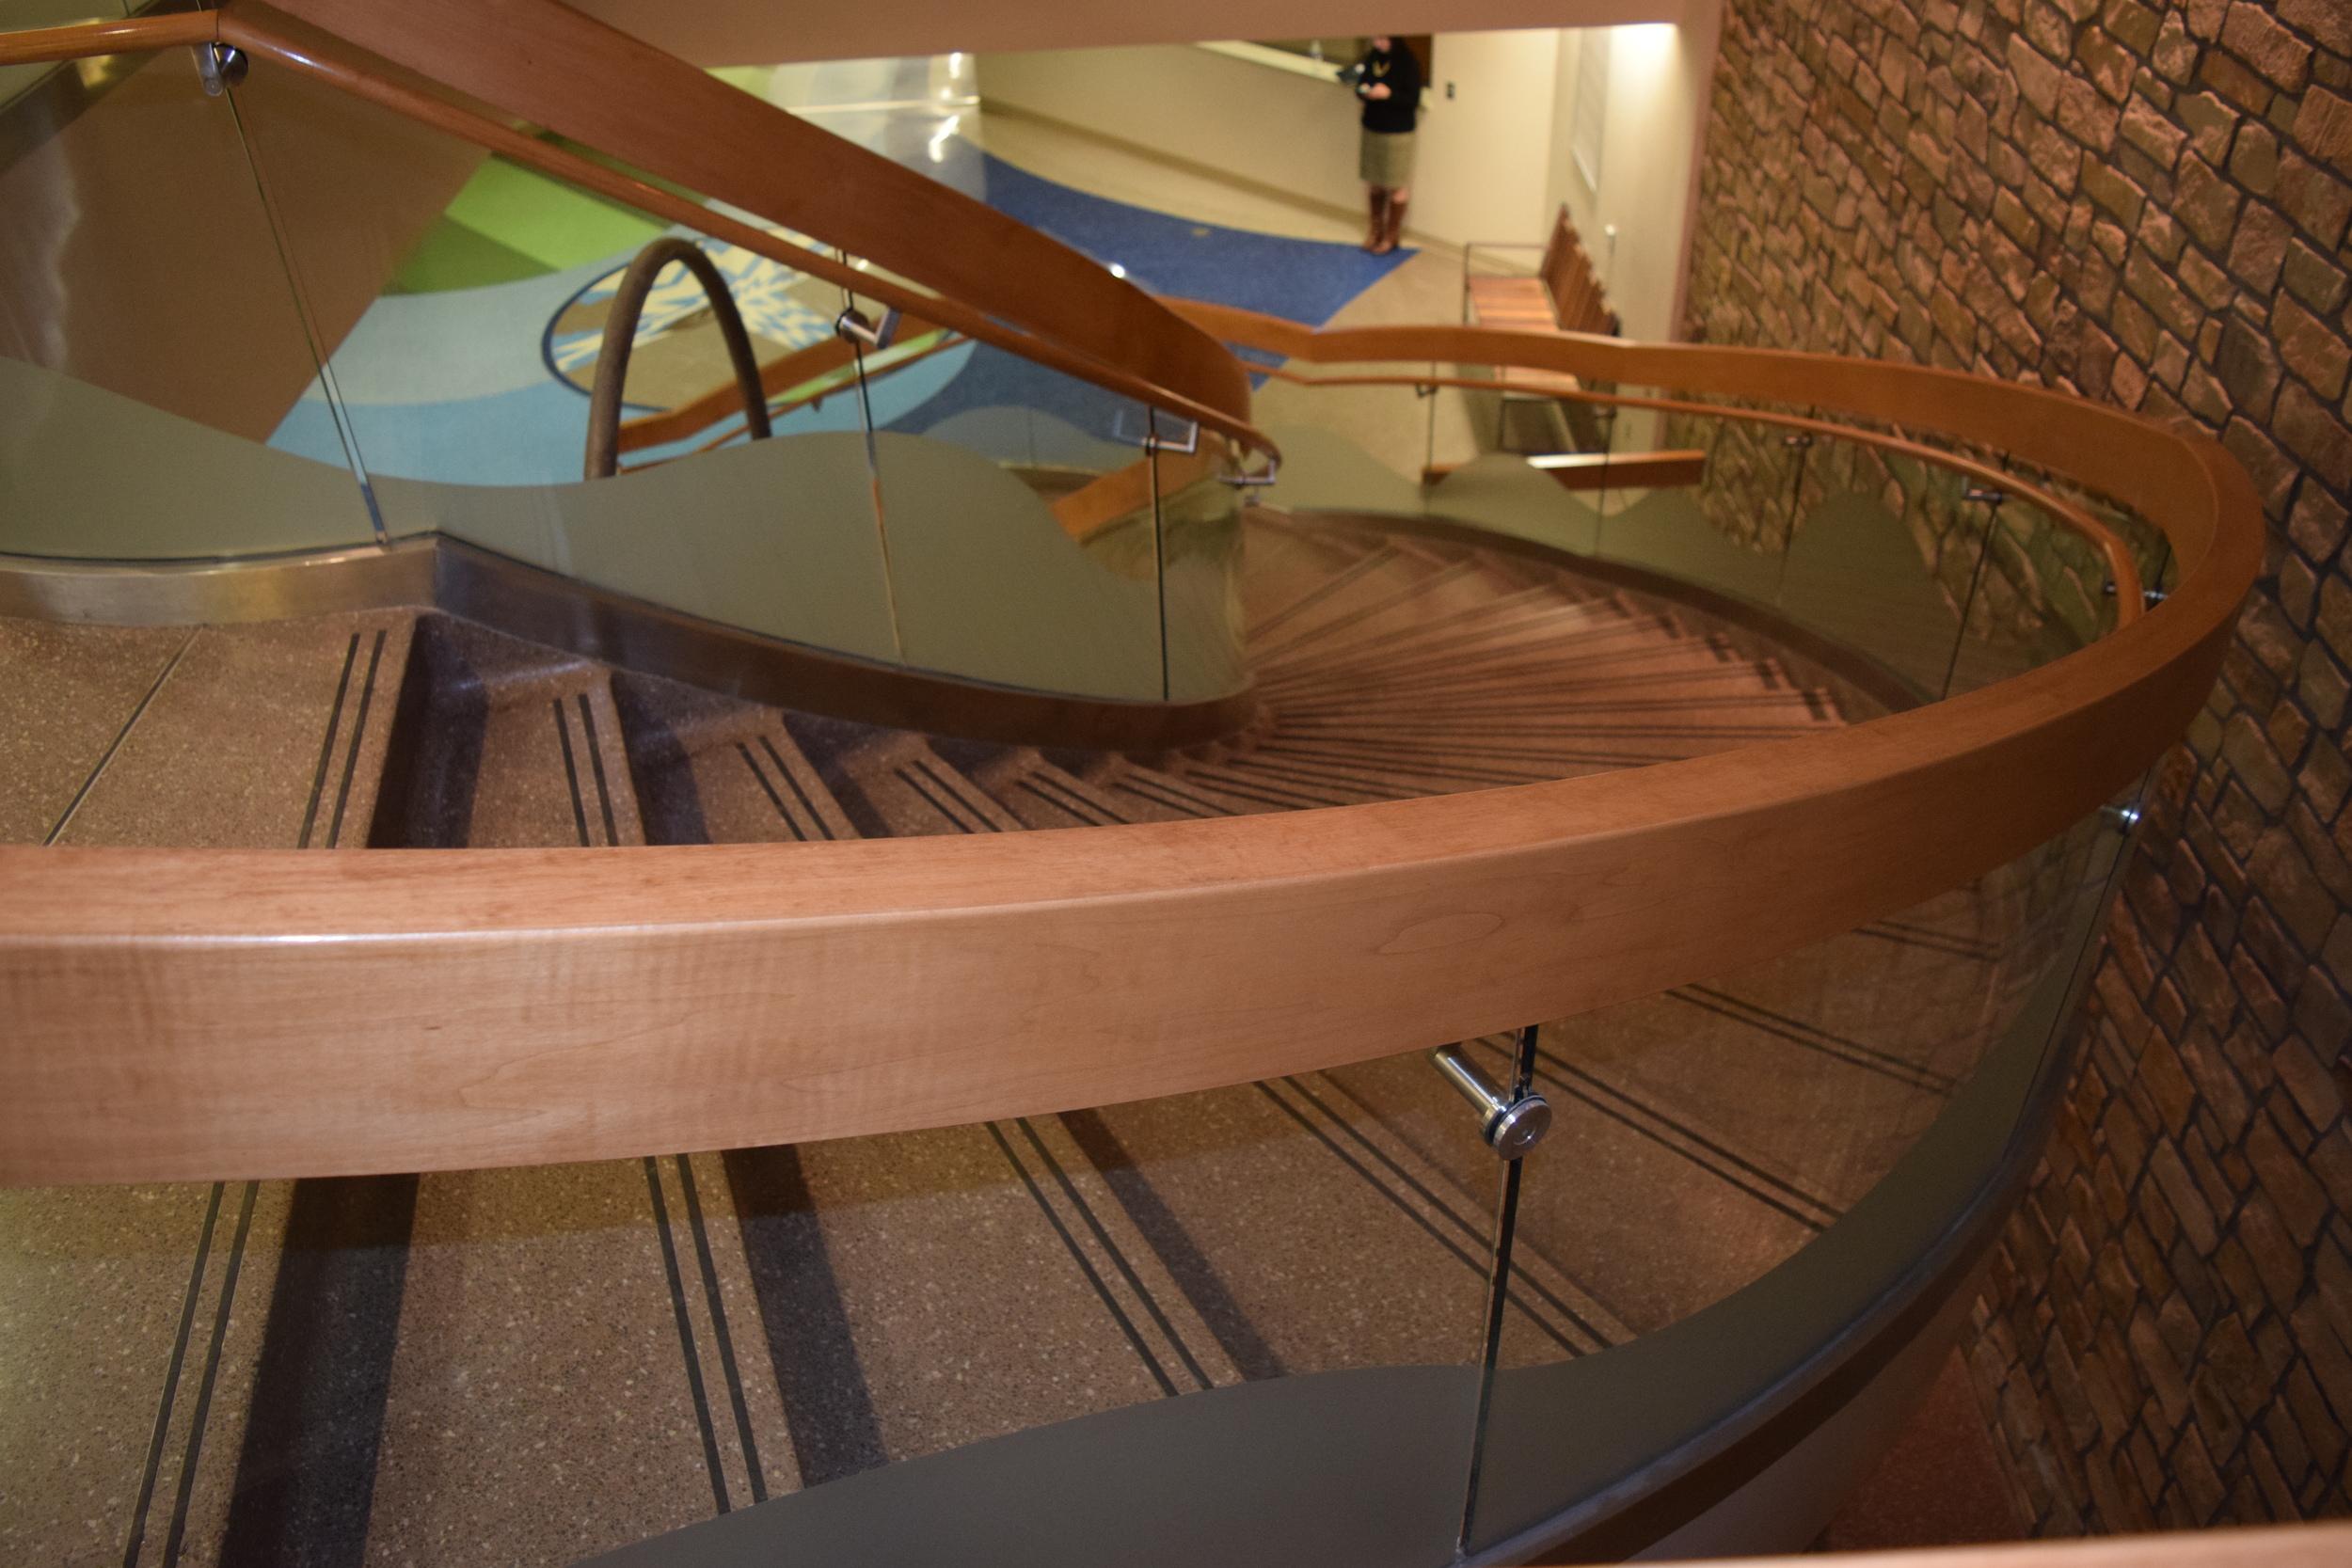 ARKANSAS CHILDREN'S HOSPITAL  Little Rock, AR  Elliptical shaped glass & wood guardrail and handrails